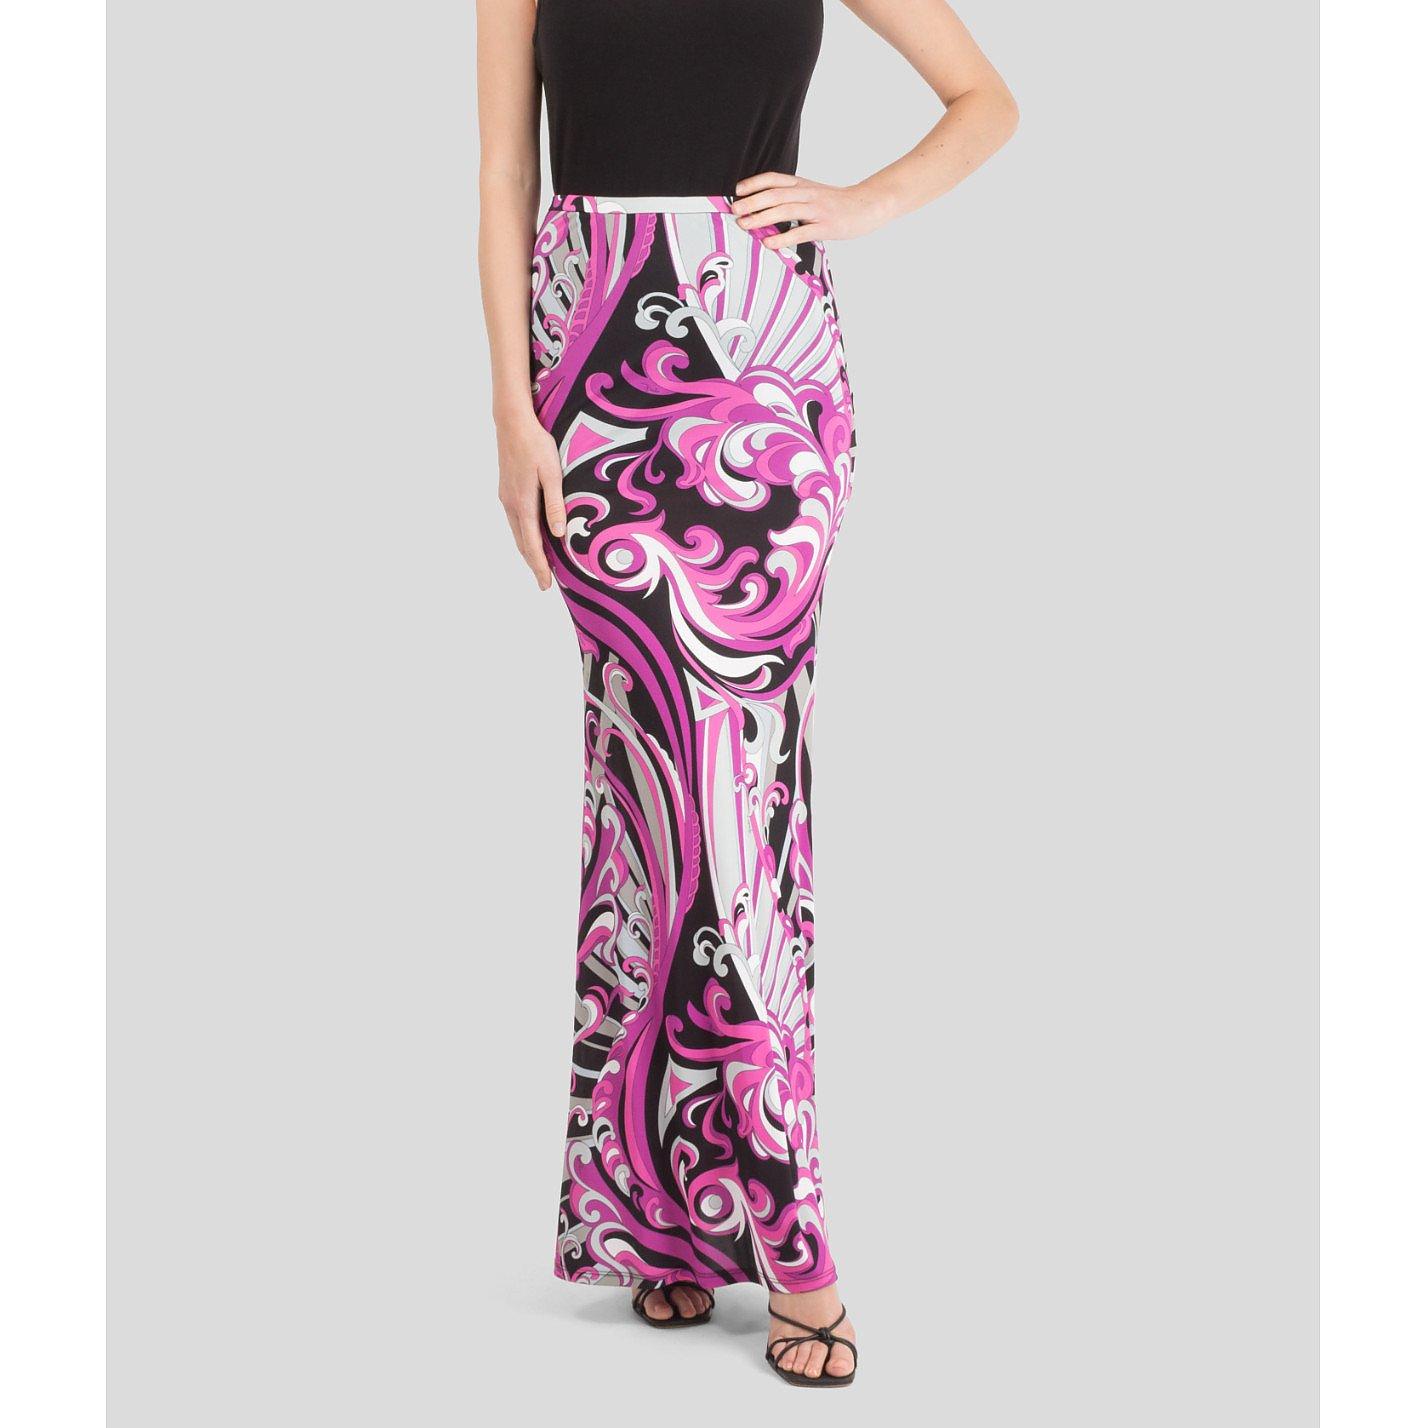 Emilio Pucci Multicolour Printed Maxi Skirt